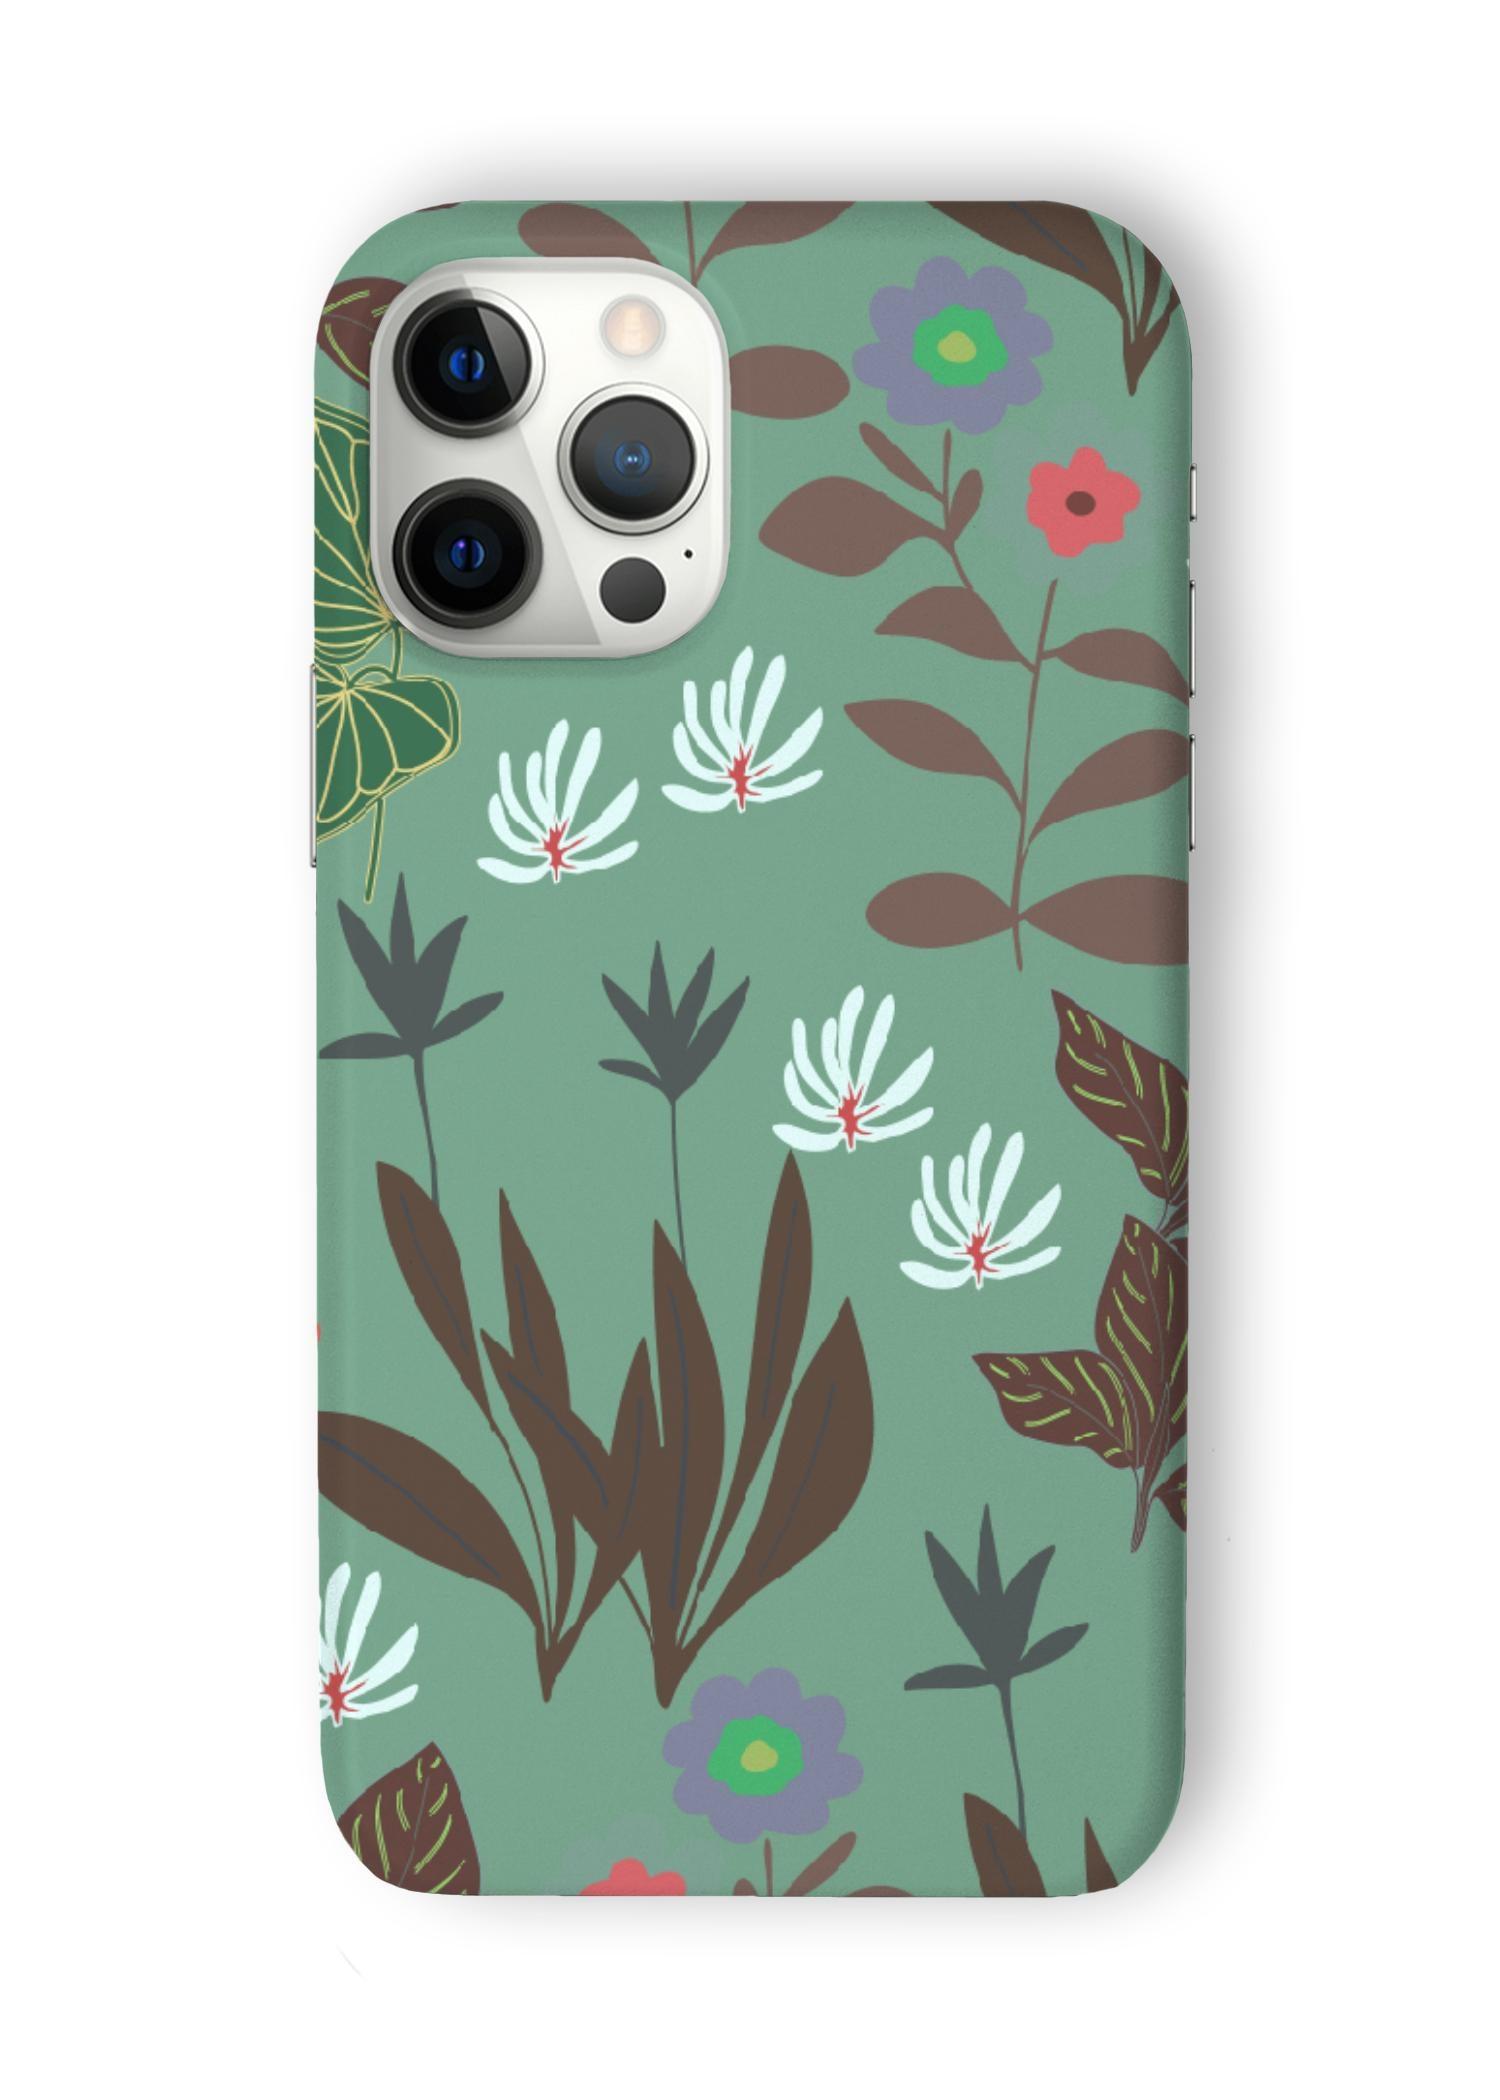 VIDA iPhone Case - Tropical Garden by VIDA Original Artist  - Size: iPhone 12 Pro Max / Ultraslim